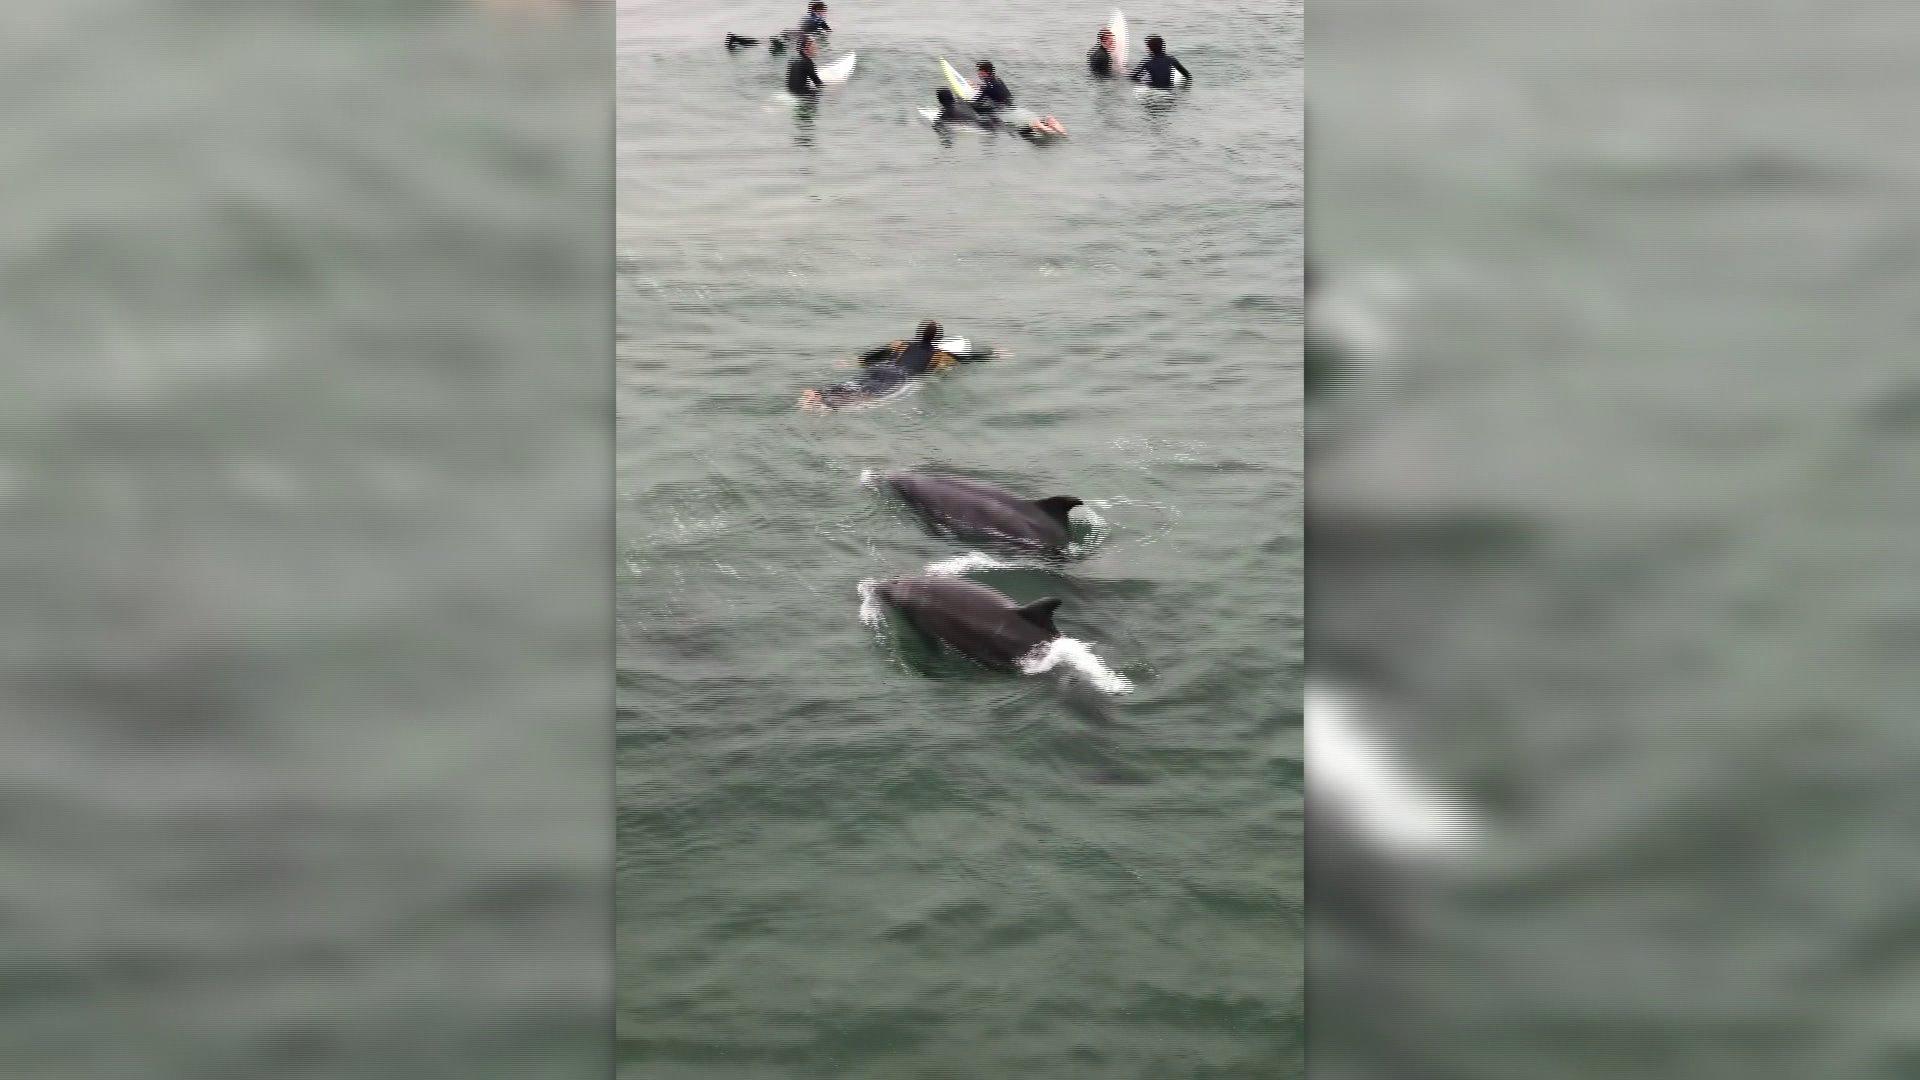 Dolphins played amid surfer at Manhattan Beach on May 30, 2019. (Credit: Robin Fenlon)